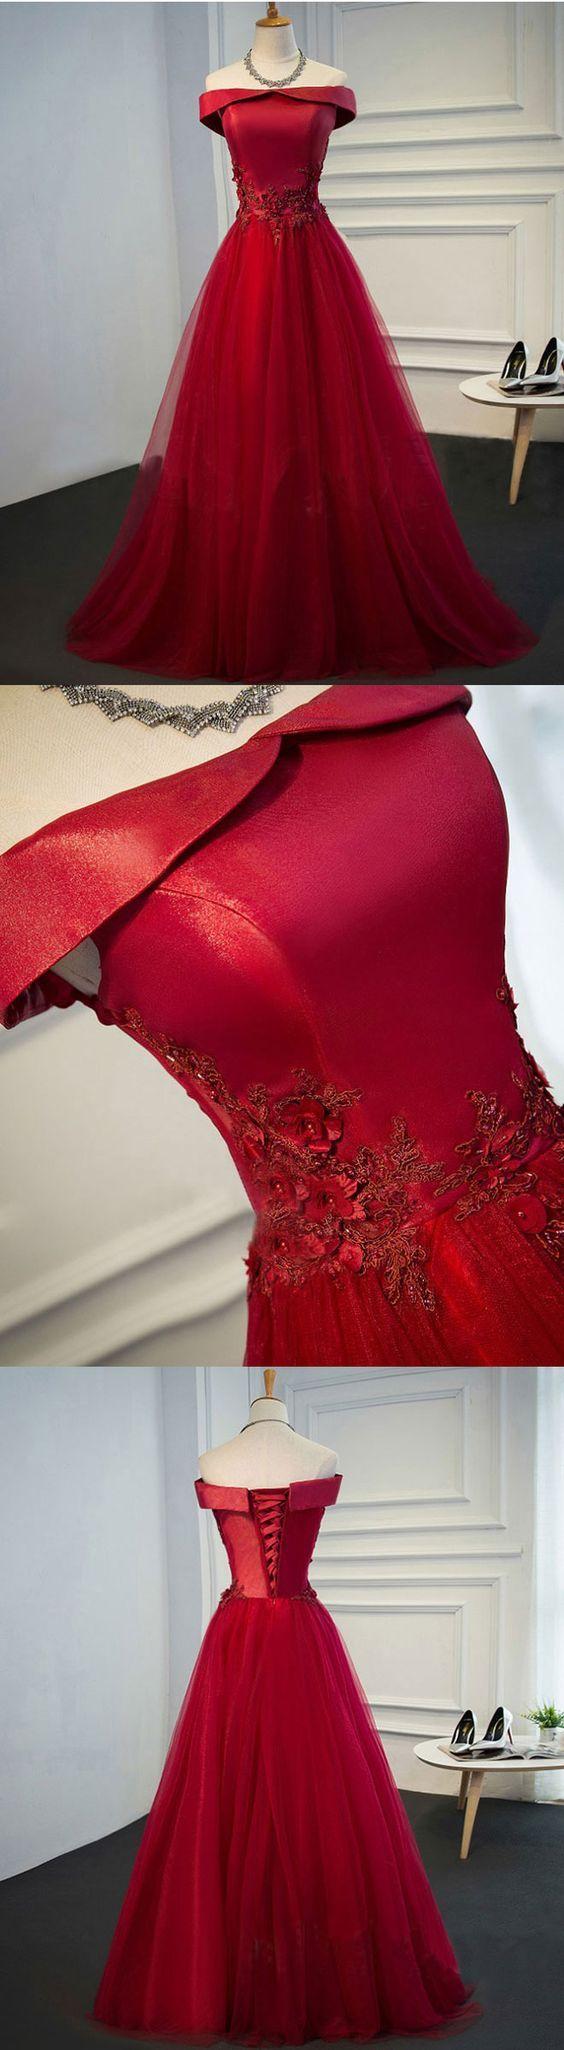 Burgundy Lace Tulle Long Prom Dress, Off Shoulder Evening Dress M1010 on Luulla